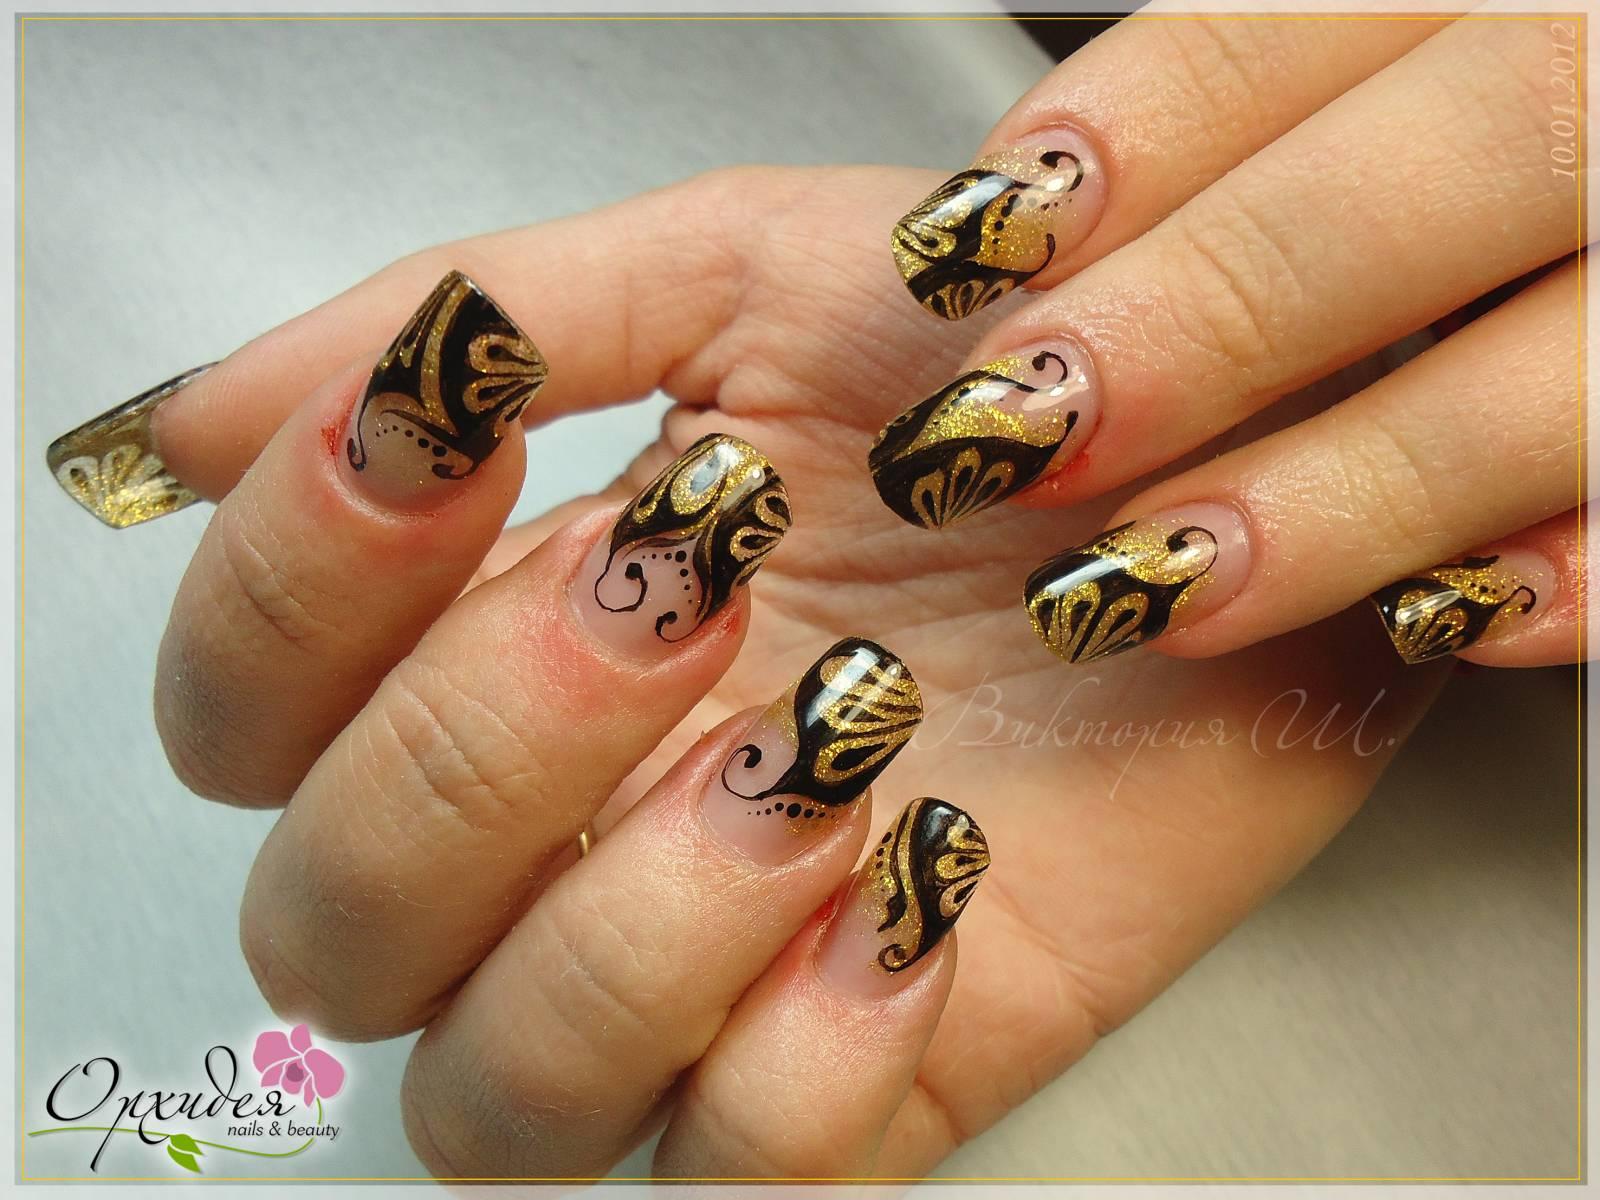 фото ногти дизайн на золотом